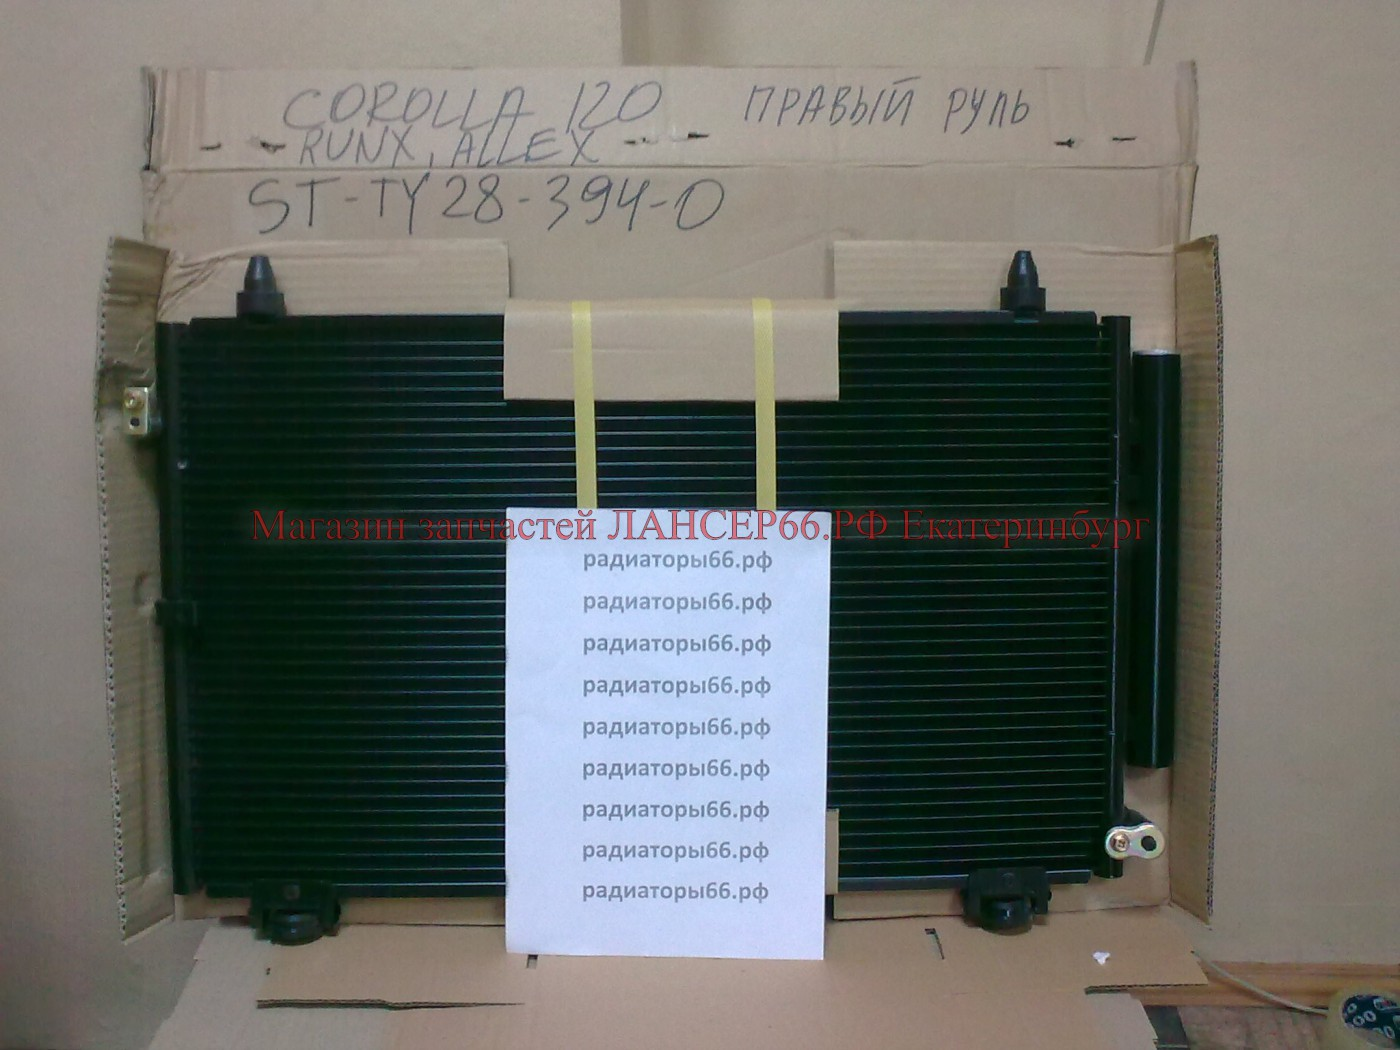 Каталог запчастей для toyota corolla e120